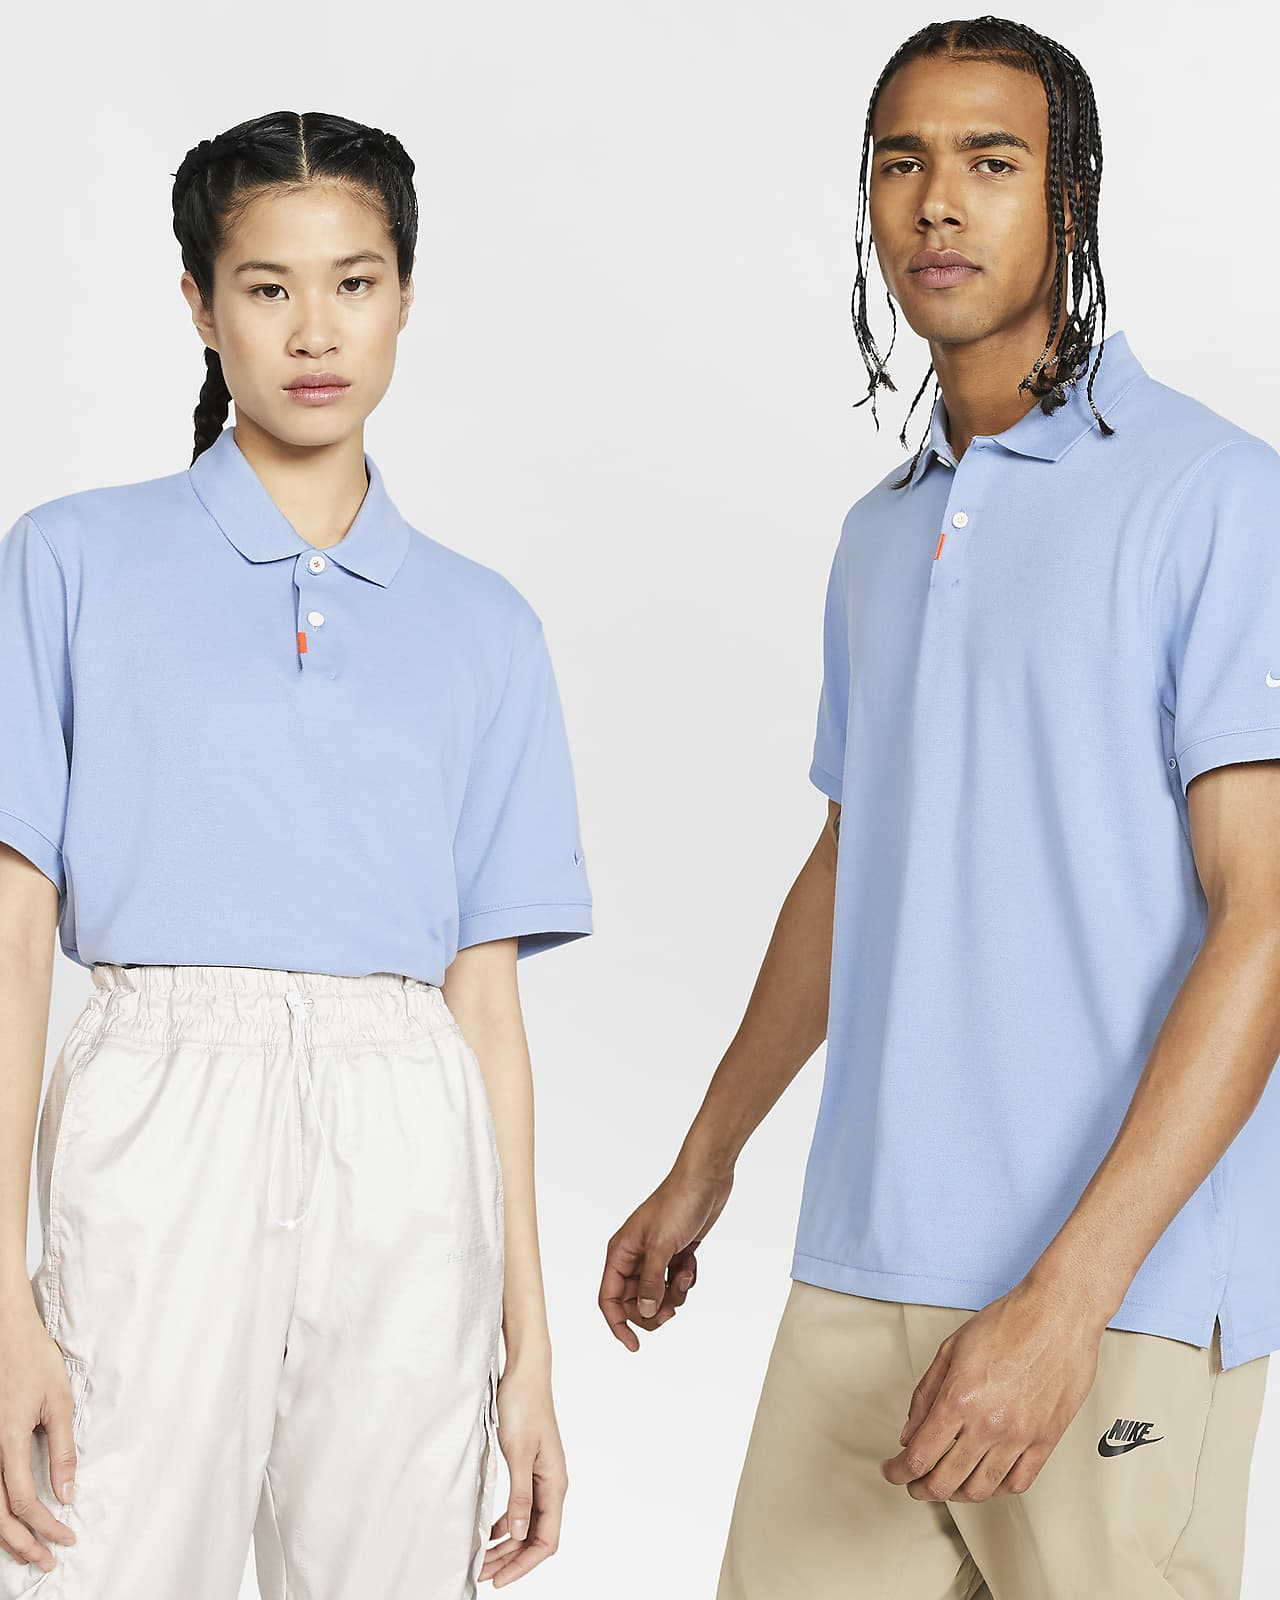 The Nike Polo 男款 Polo 衫